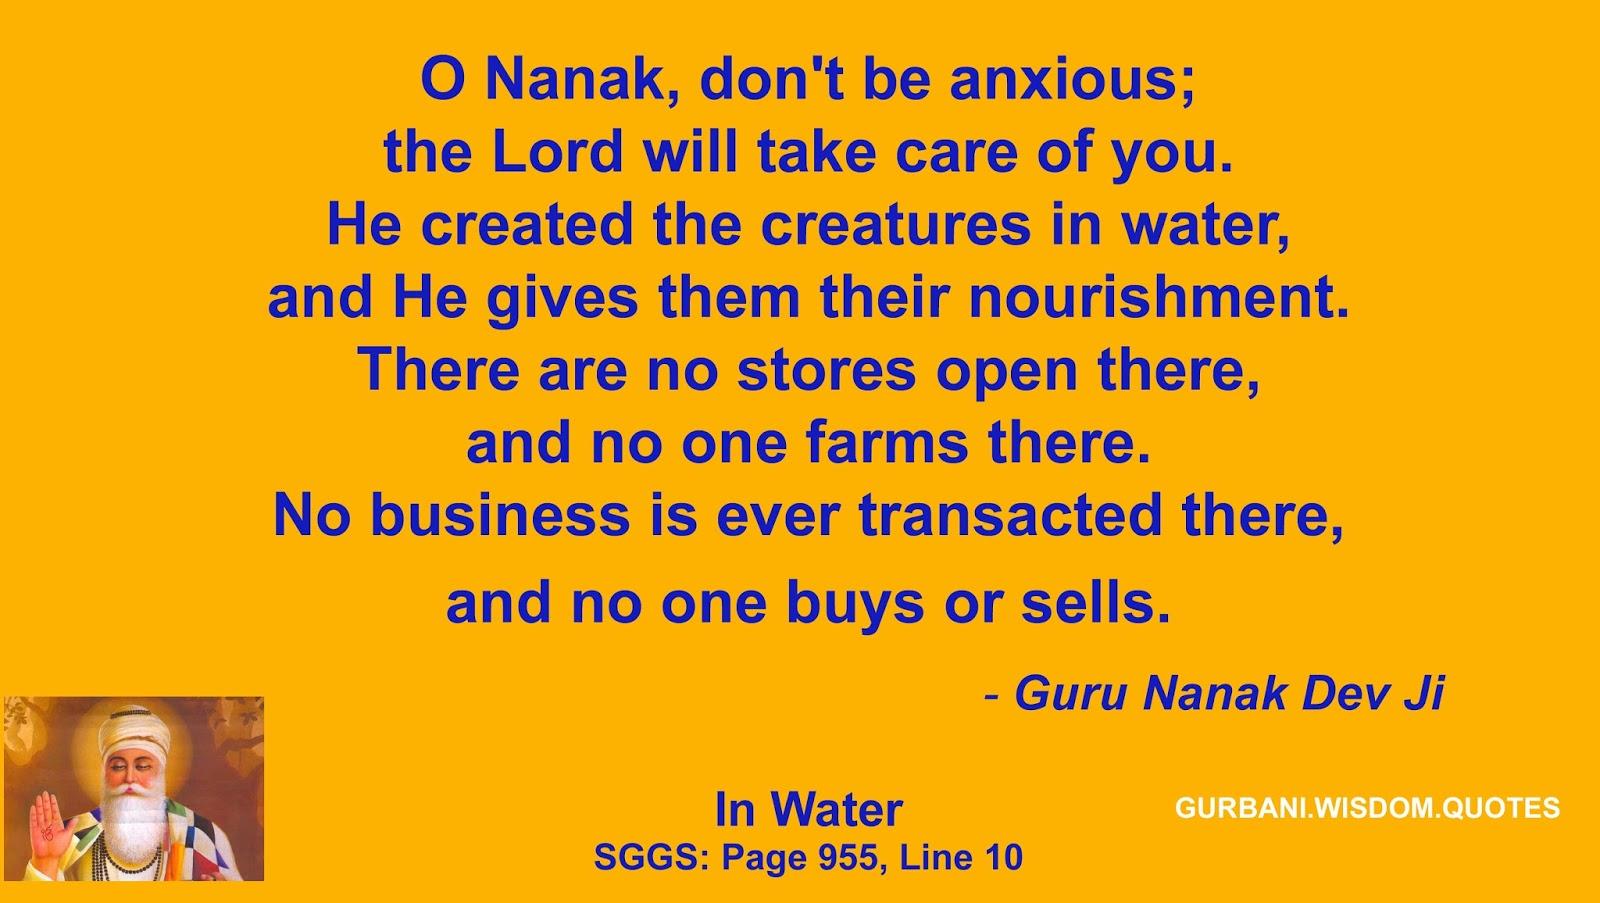 2017 05 guru nanak dev ji quotes - Quote 214 284 Guru Nanak Dev Ji Creatures In Water